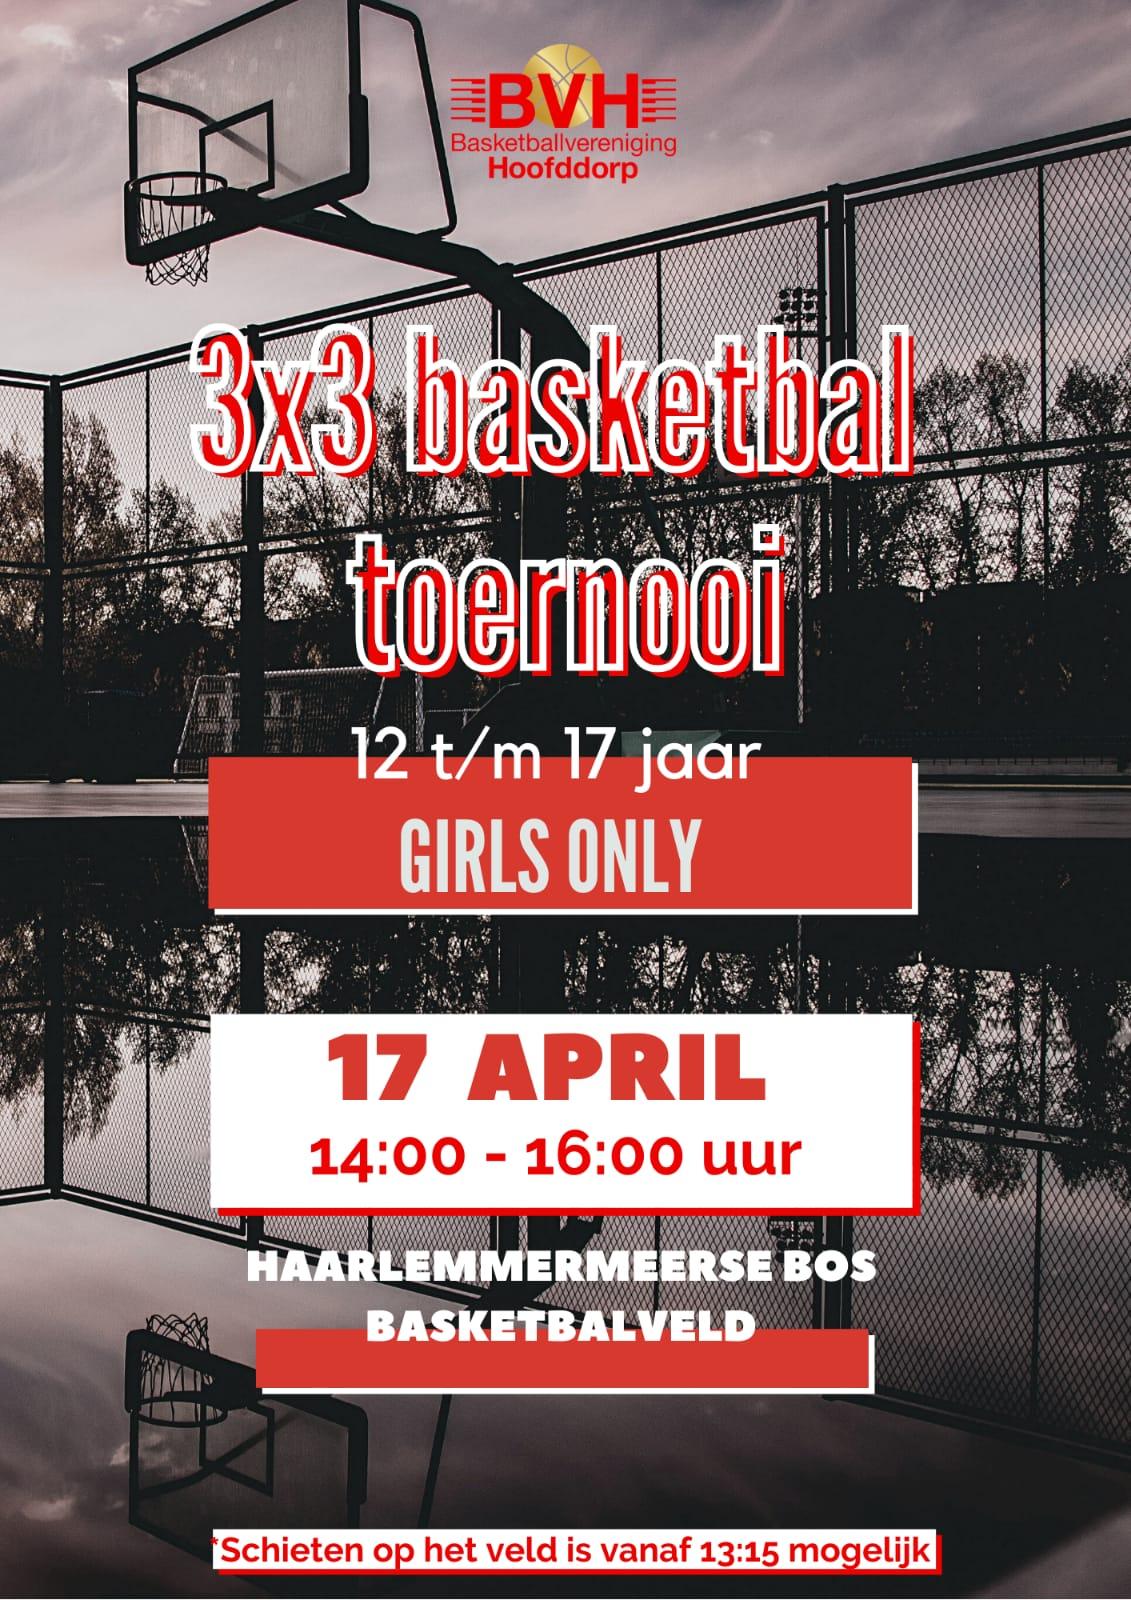 3x3 Girls only basketbal toernooi op 17 april